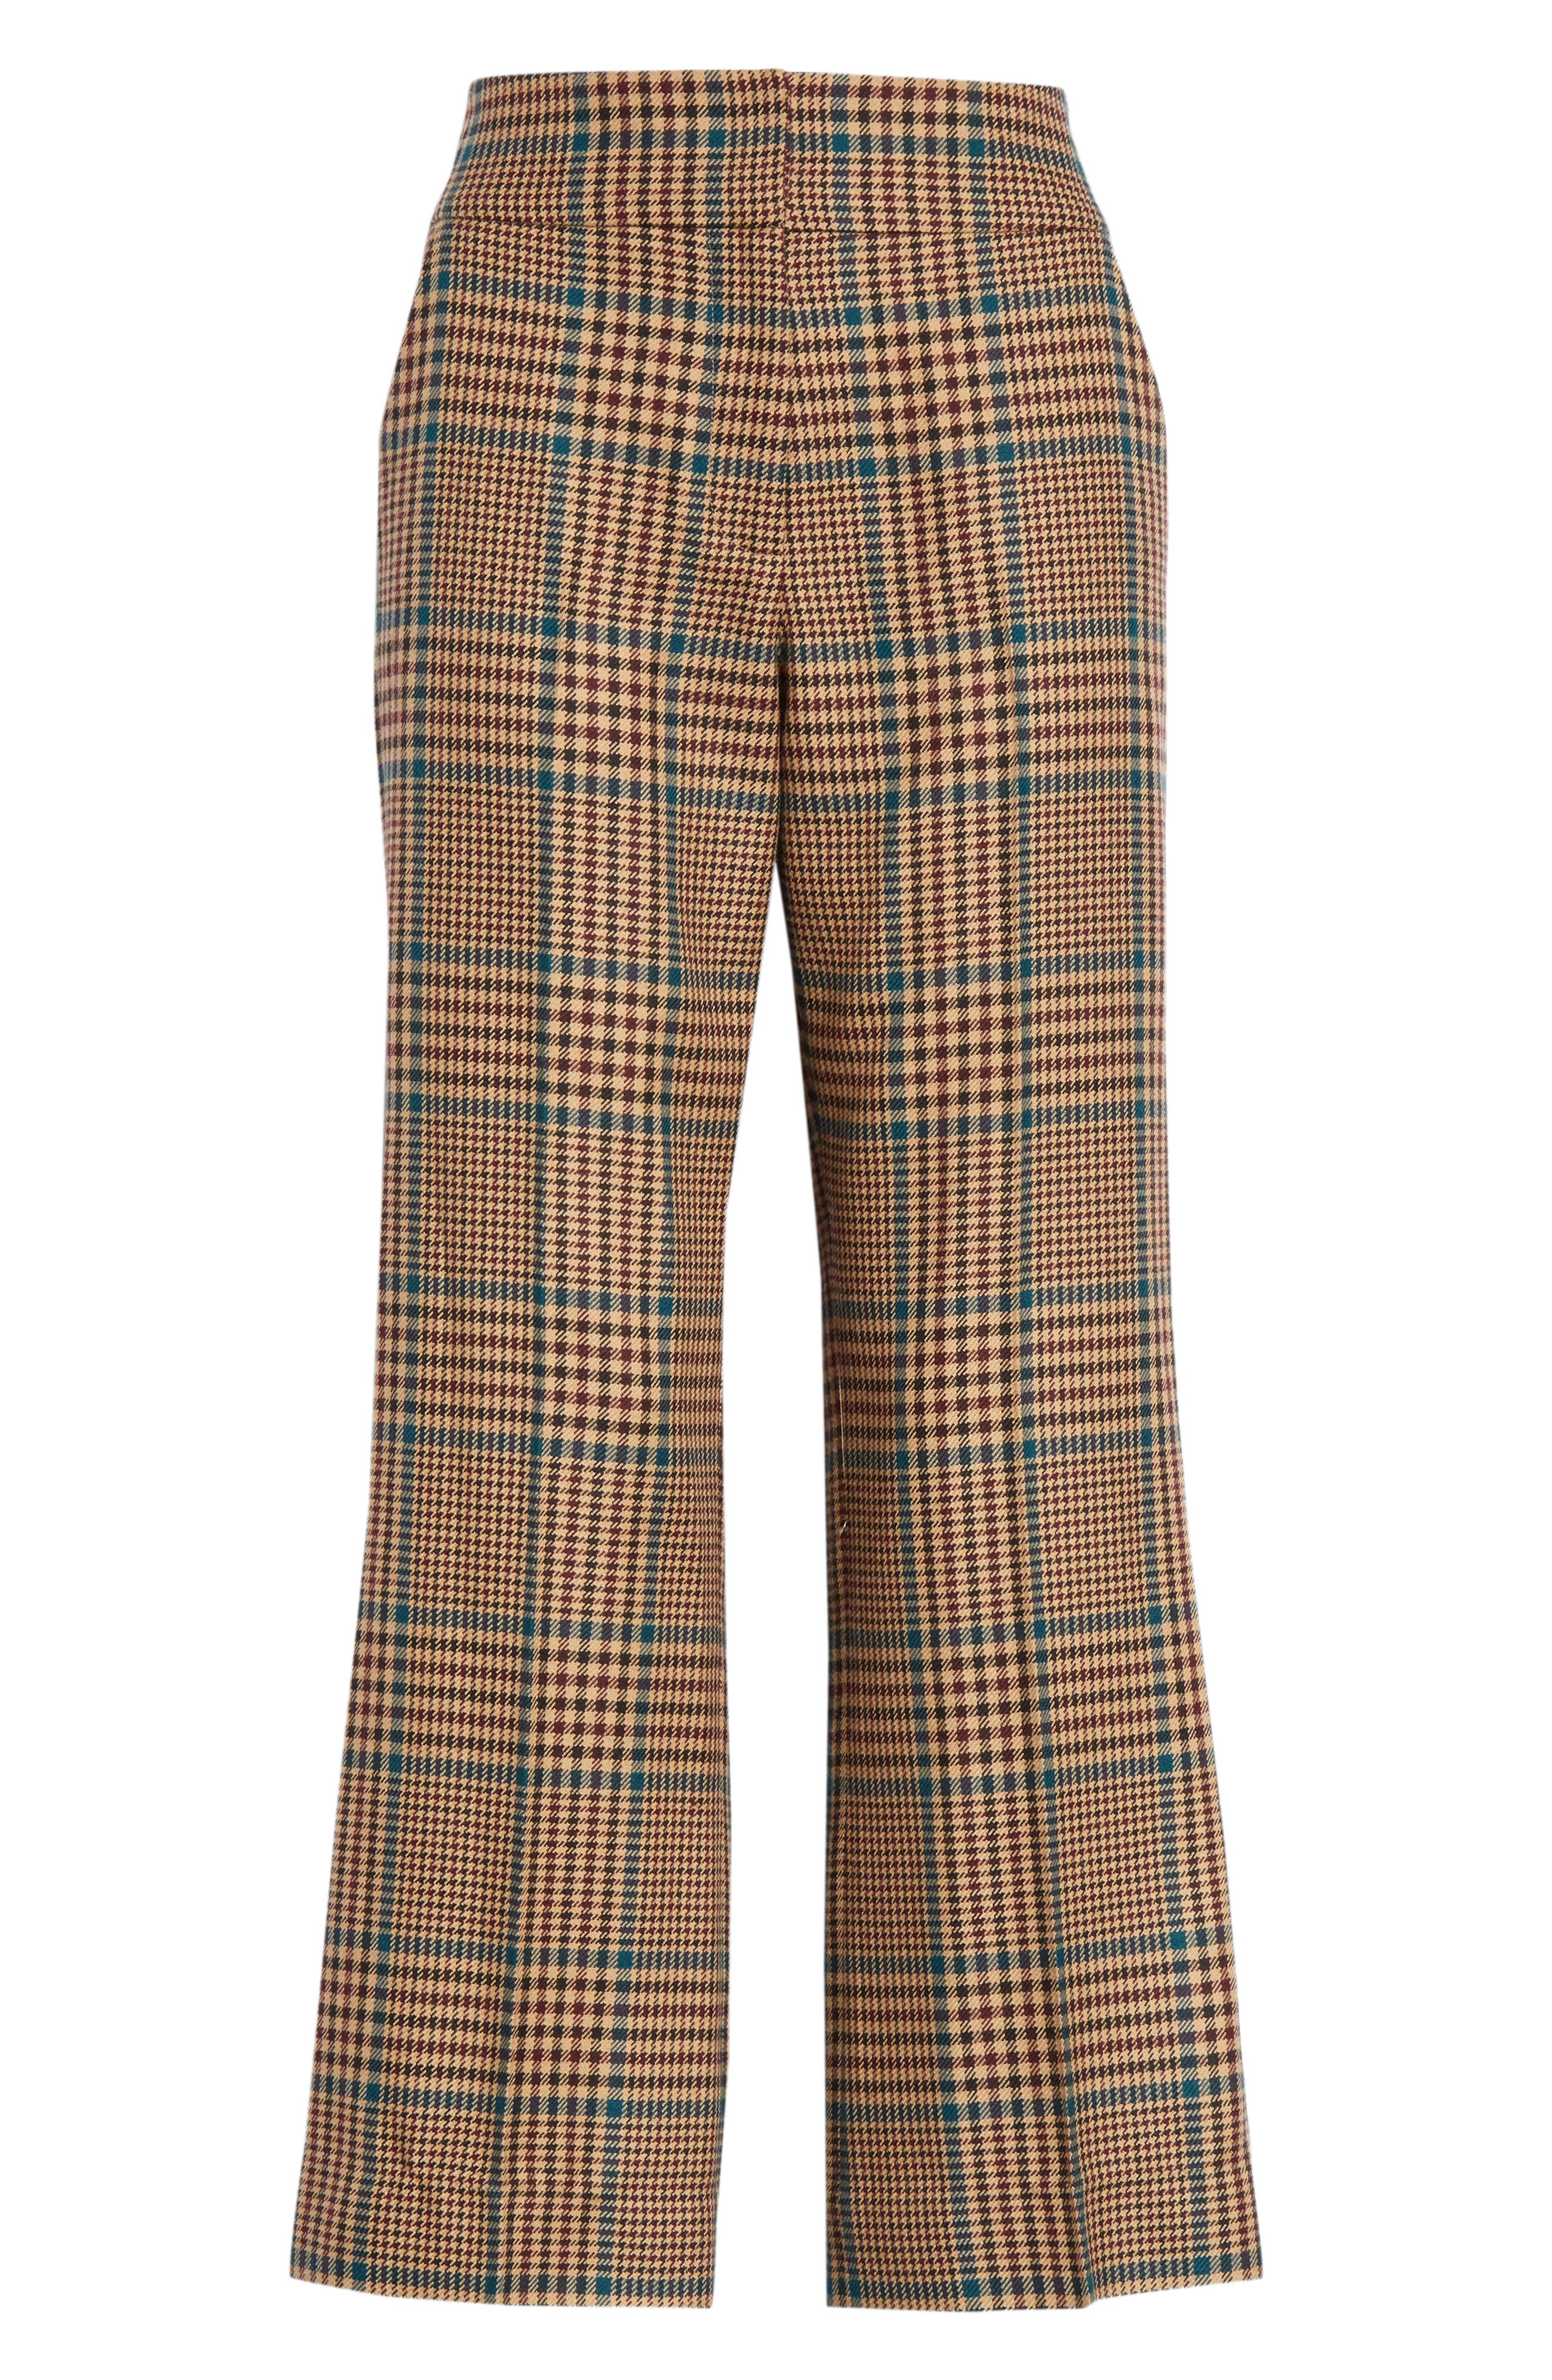 Cormac Plaid Wool Blend Trousers,                             Alternate thumbnail 6, color,                             230